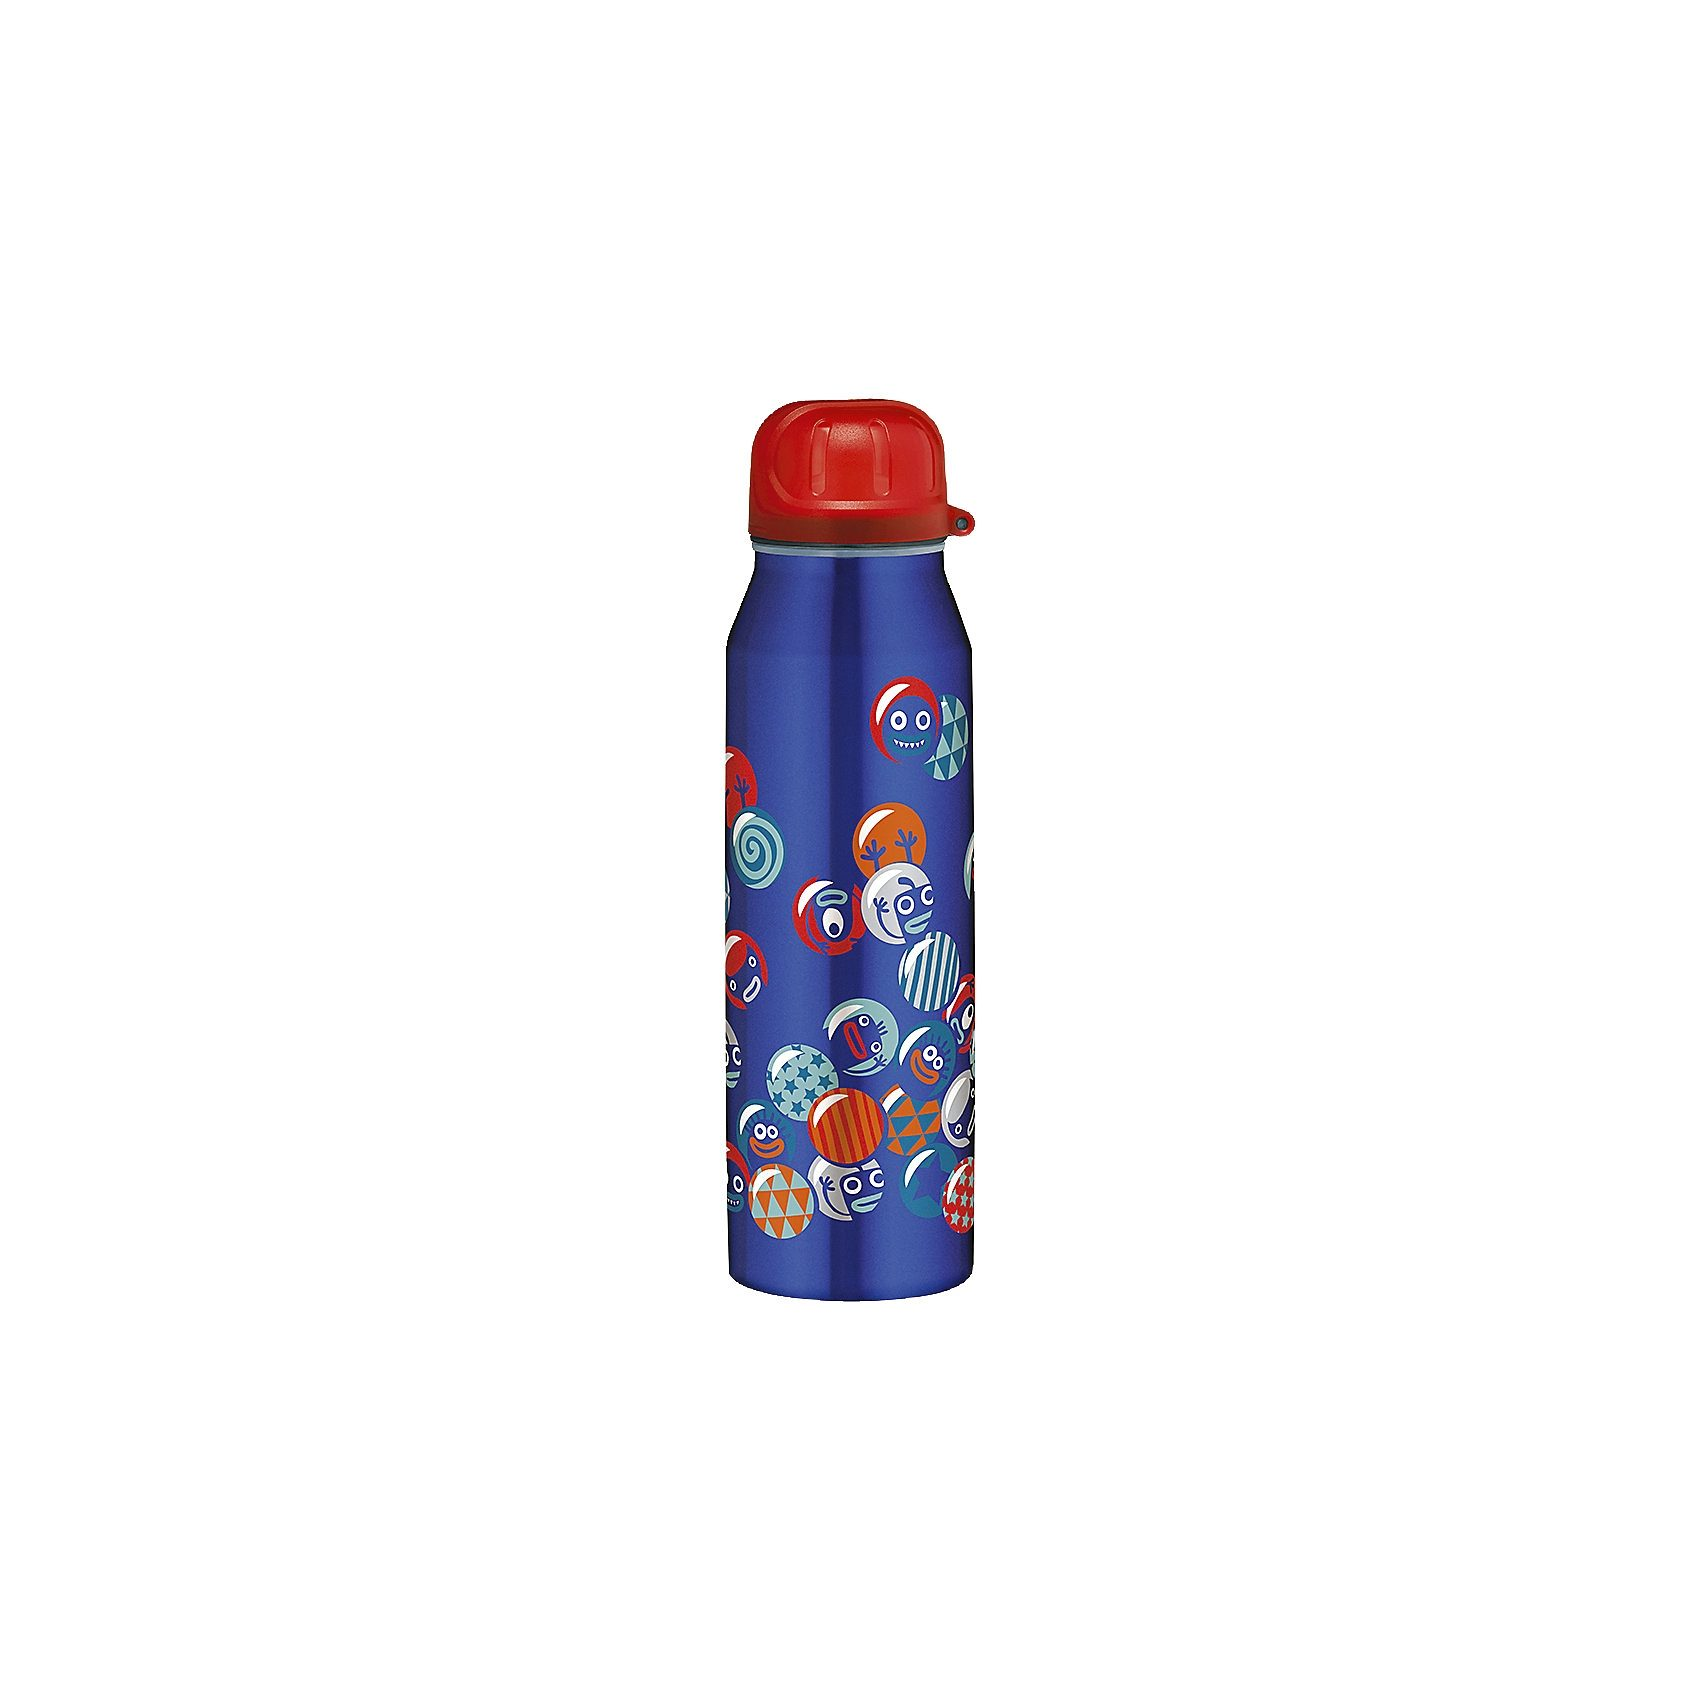 Alfi Isolier-Trinkflasche Crazy balls, 0,5 l